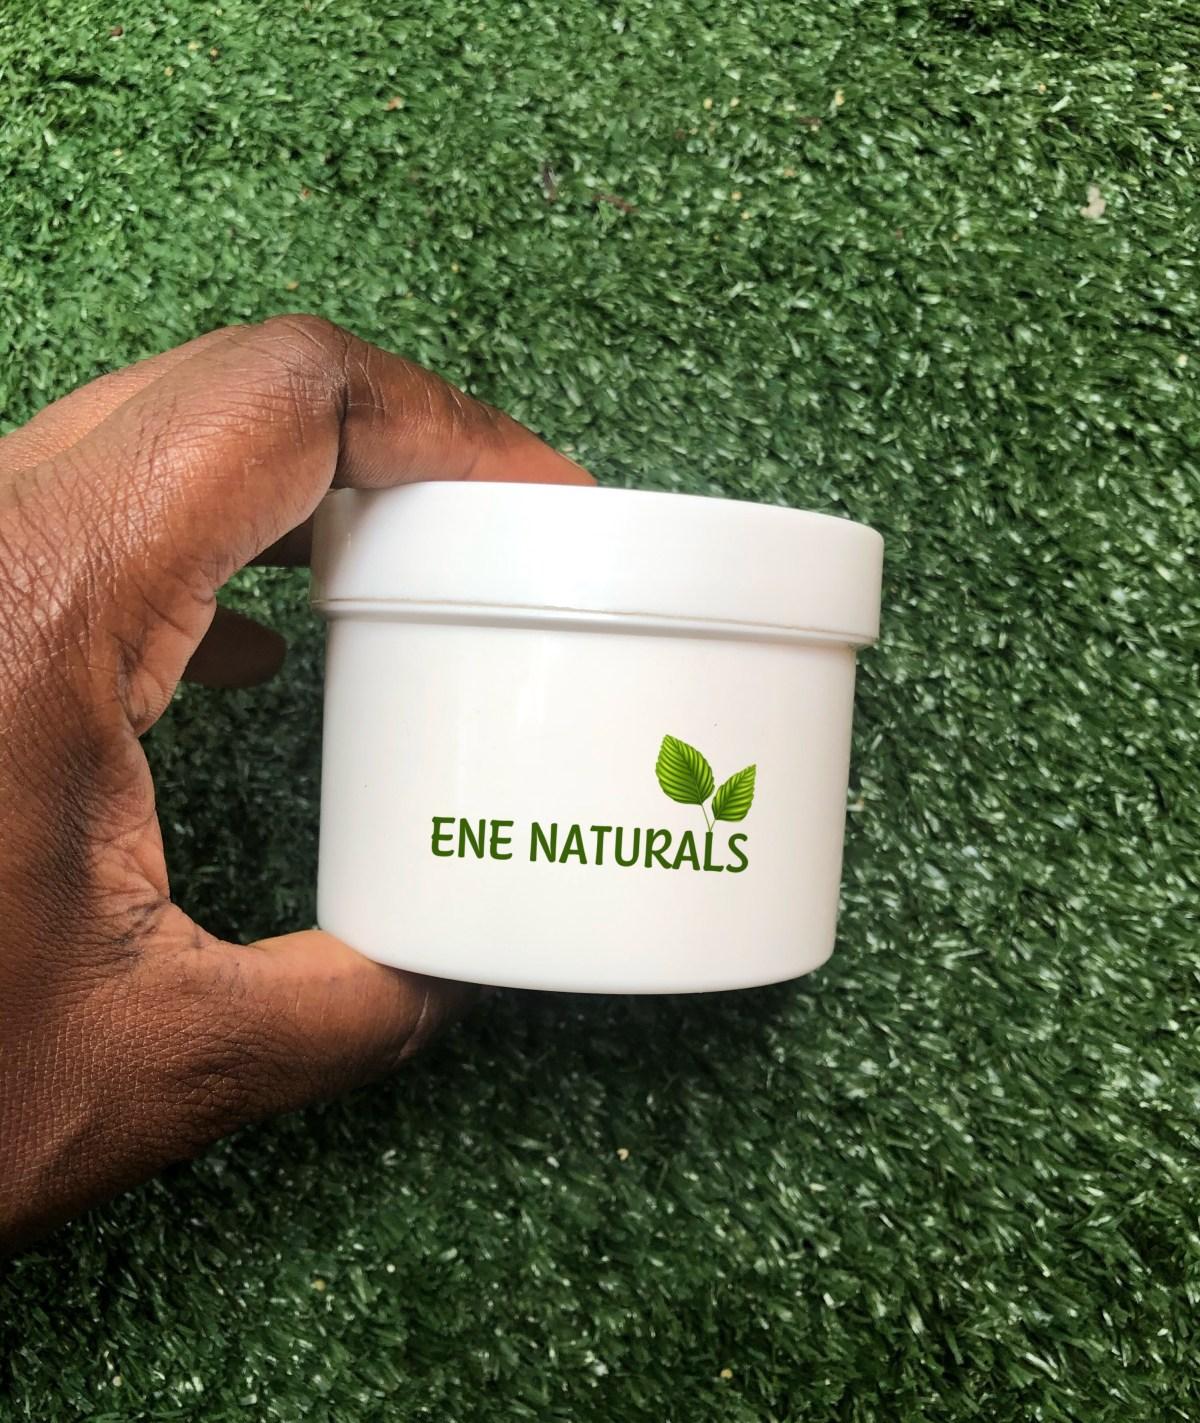 ene naturals skincare